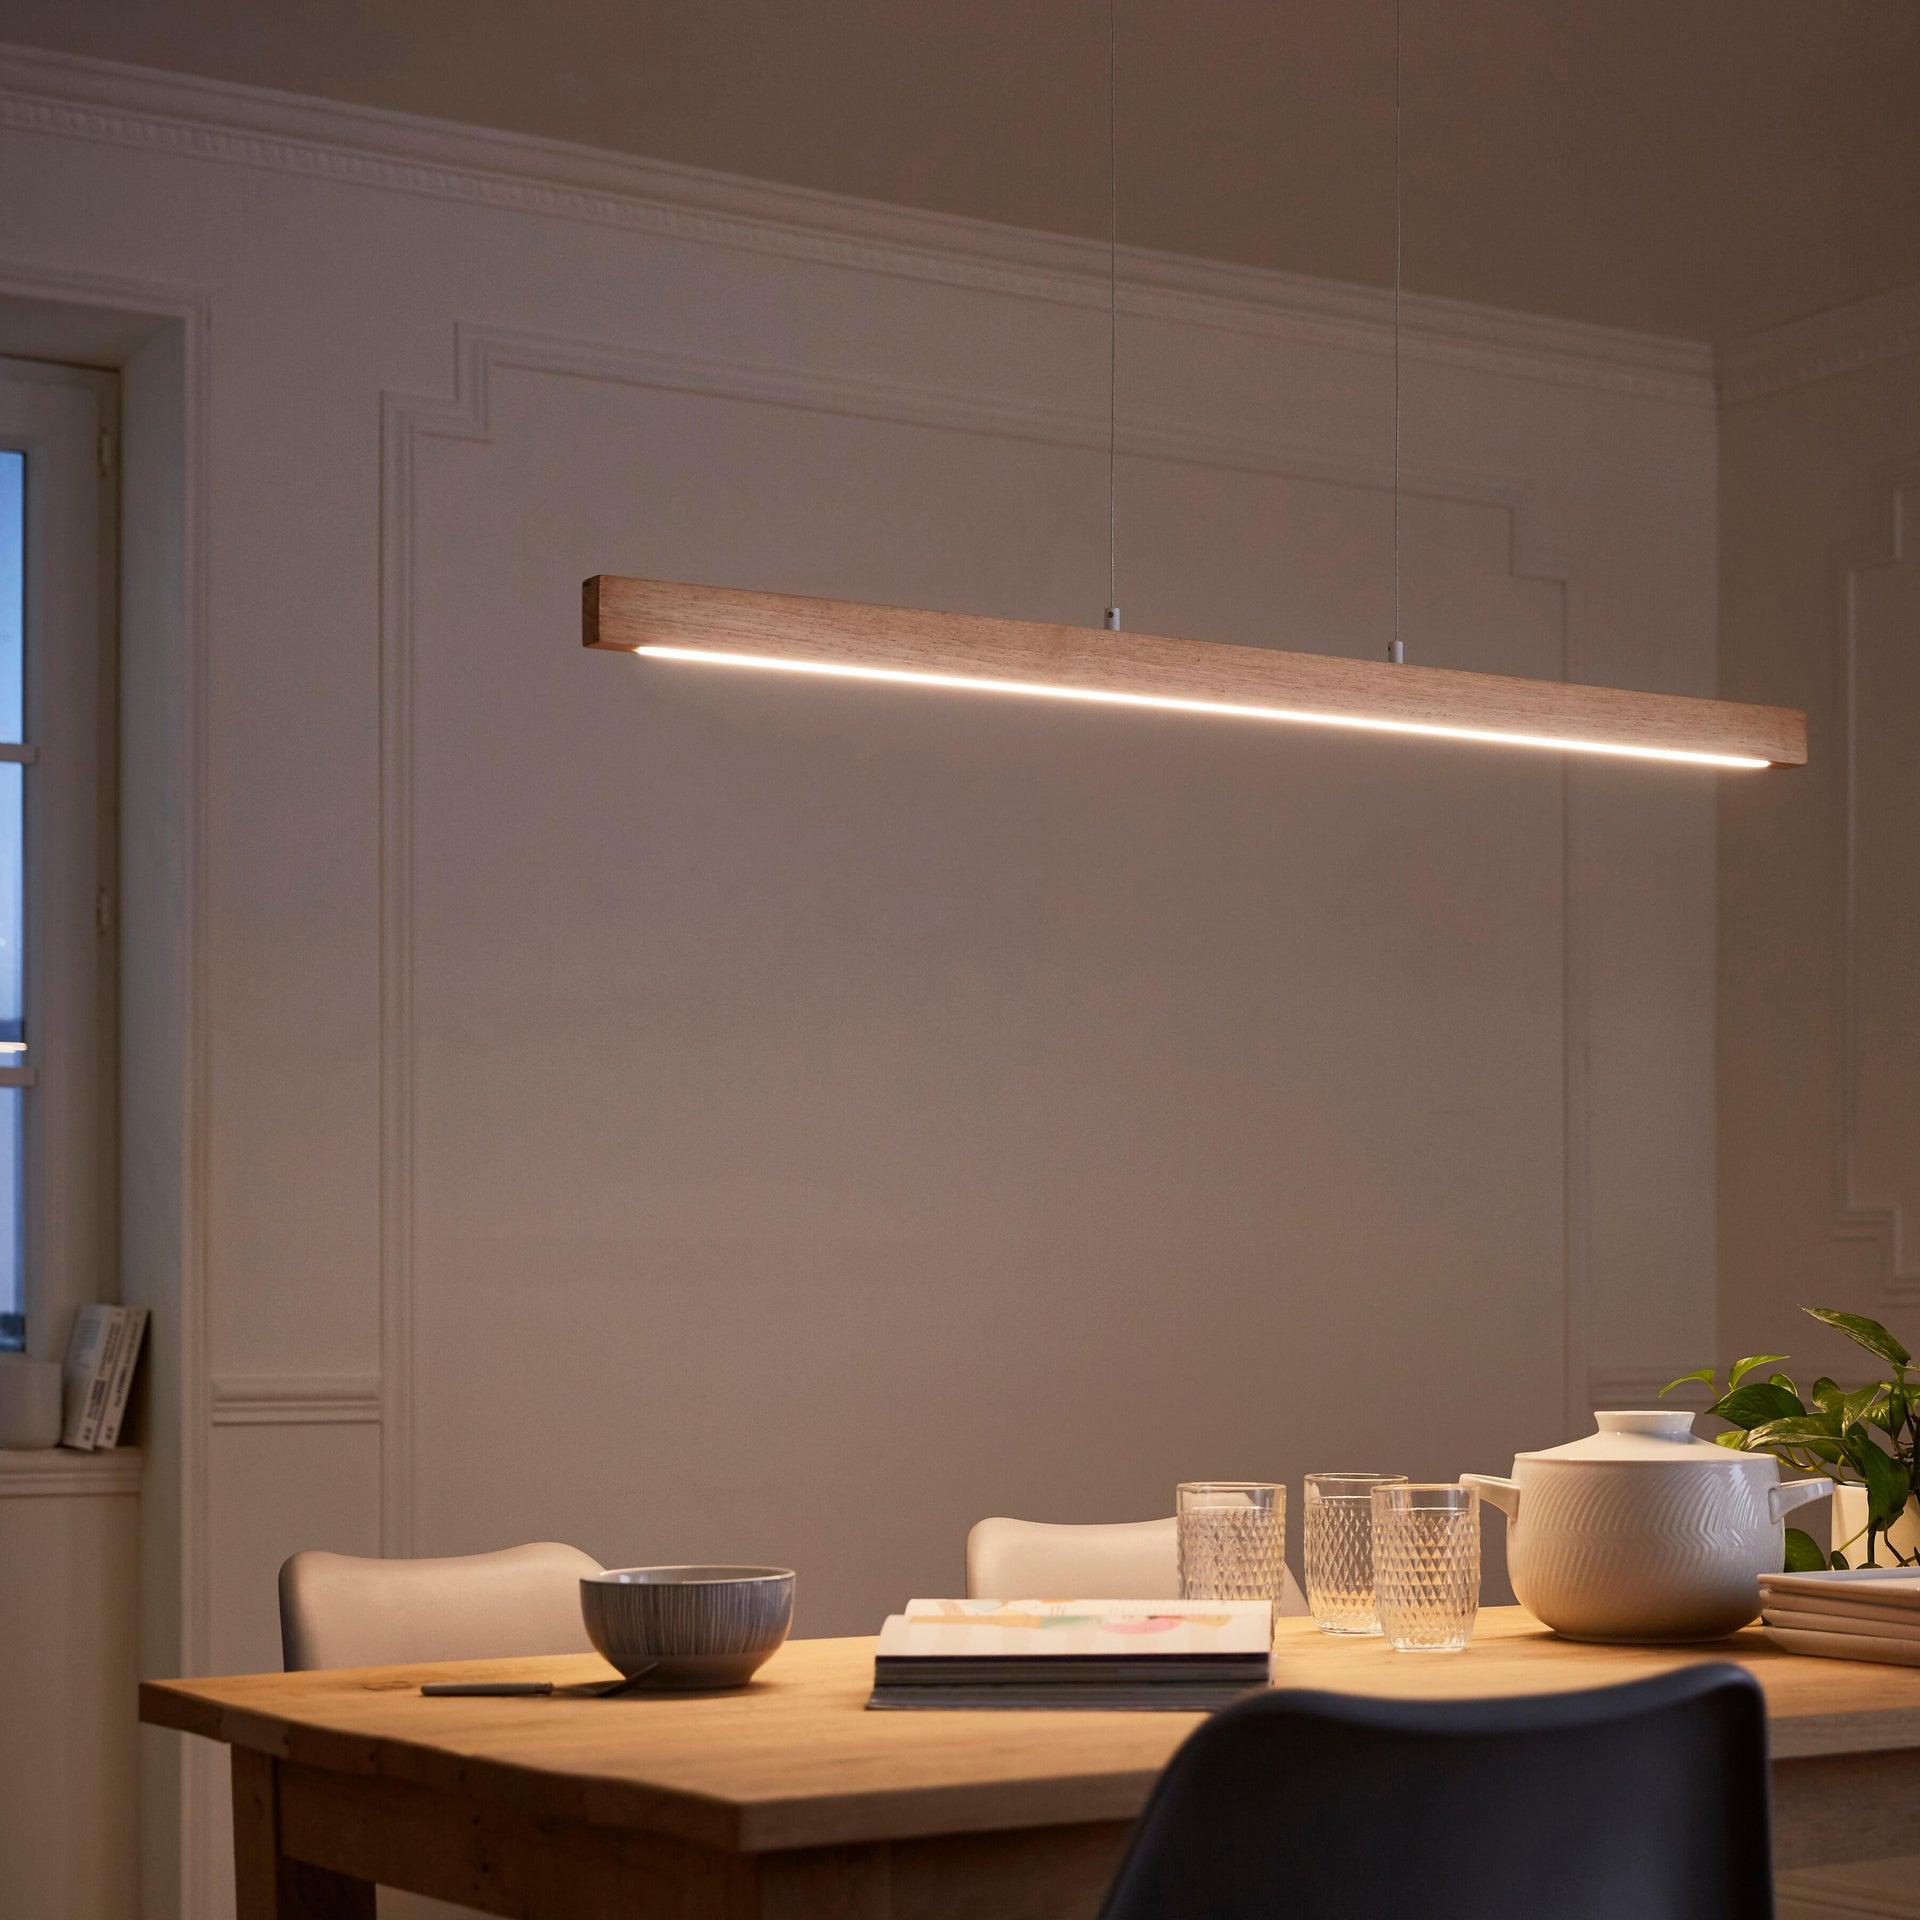 Lampadario Scandinavo Namu LED integrato legno, in legno, L. 118 cm, INSPIRE - 4